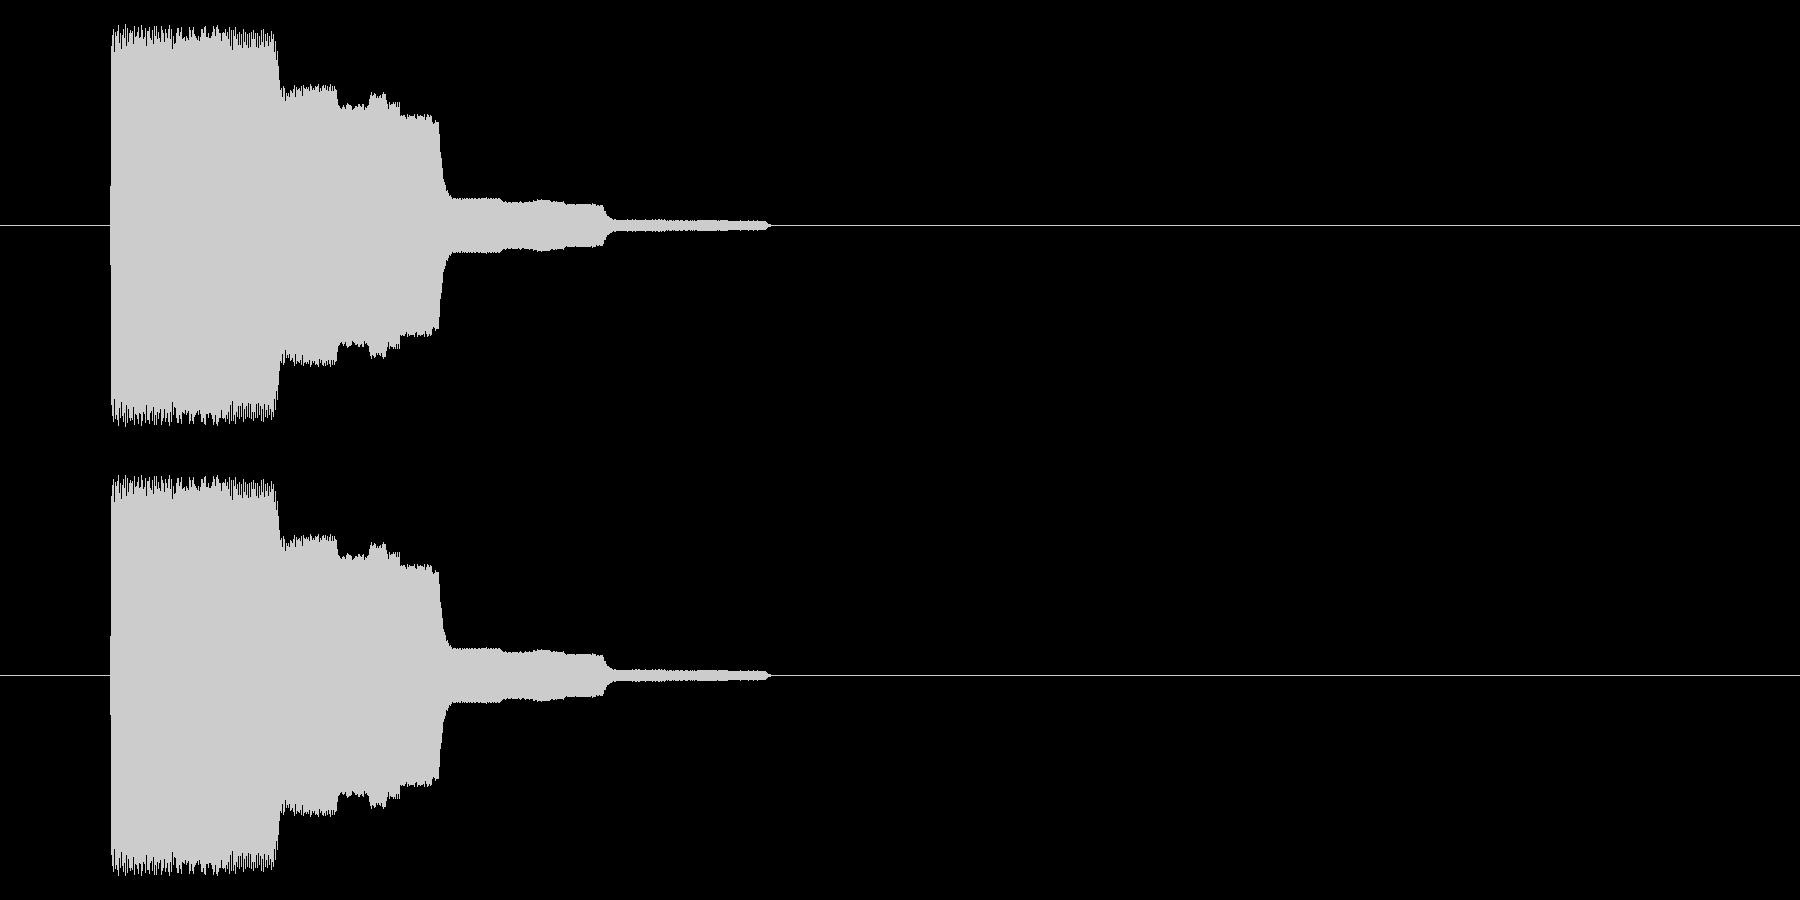 【GB 汎用01-01(ピッチ)】 の未再生の波形